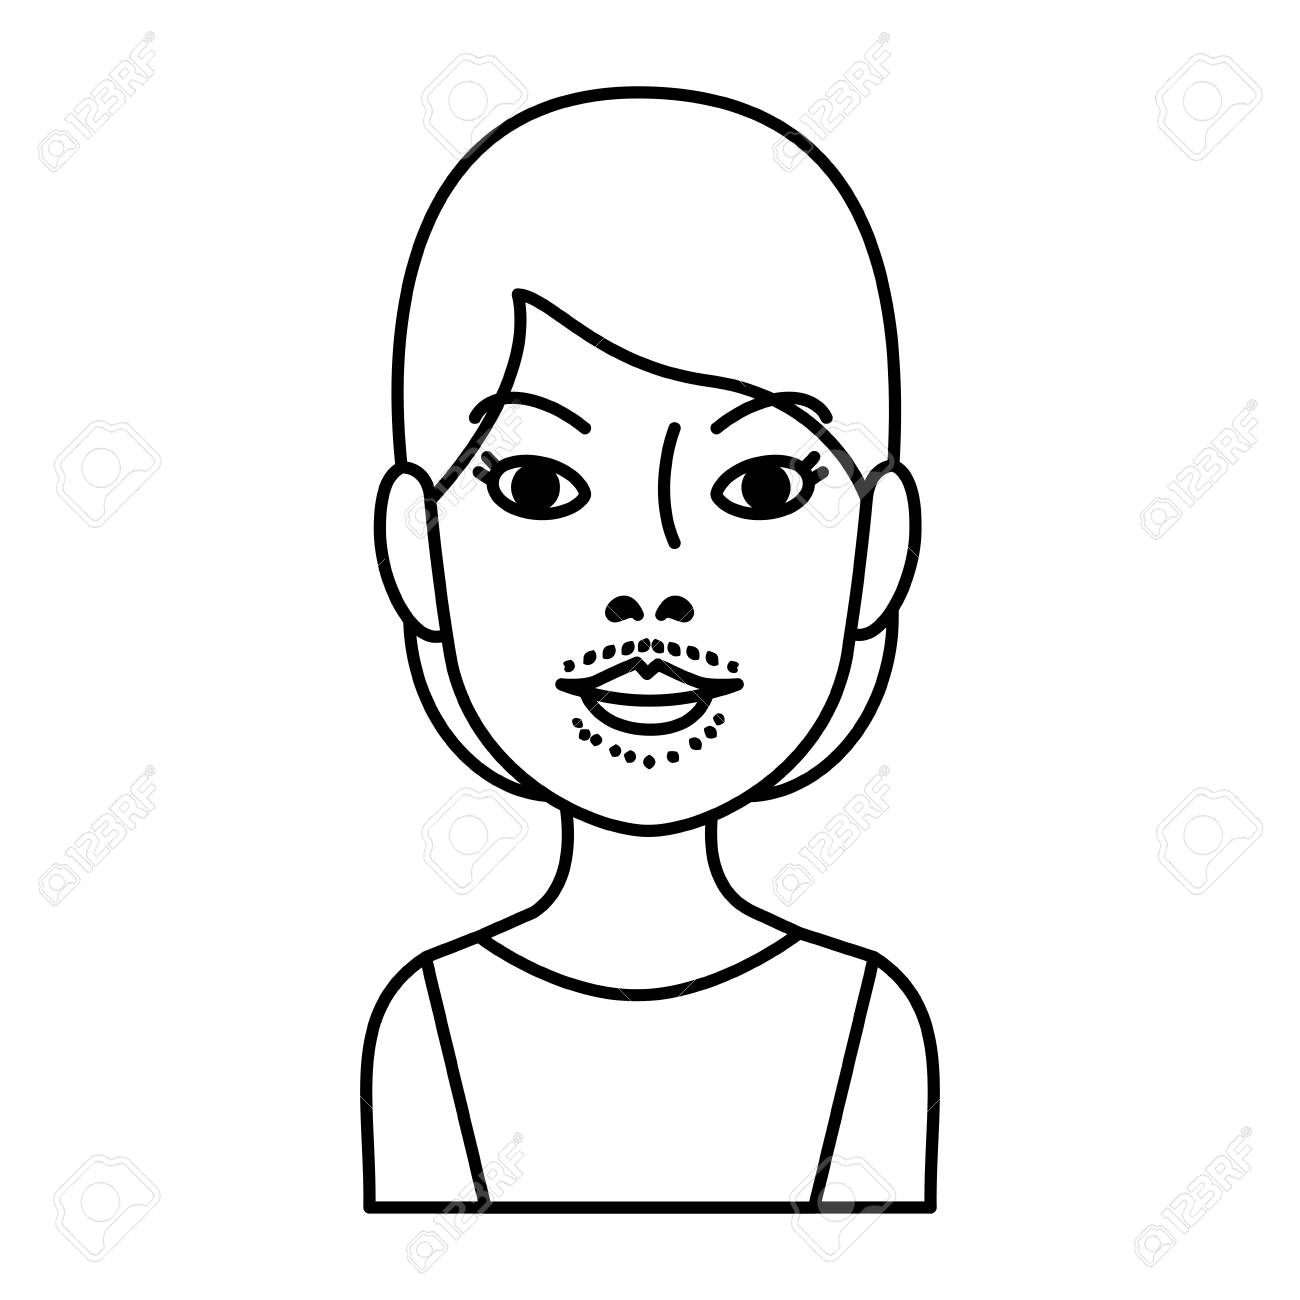 woman with facial hair vector illustration design - 109889976